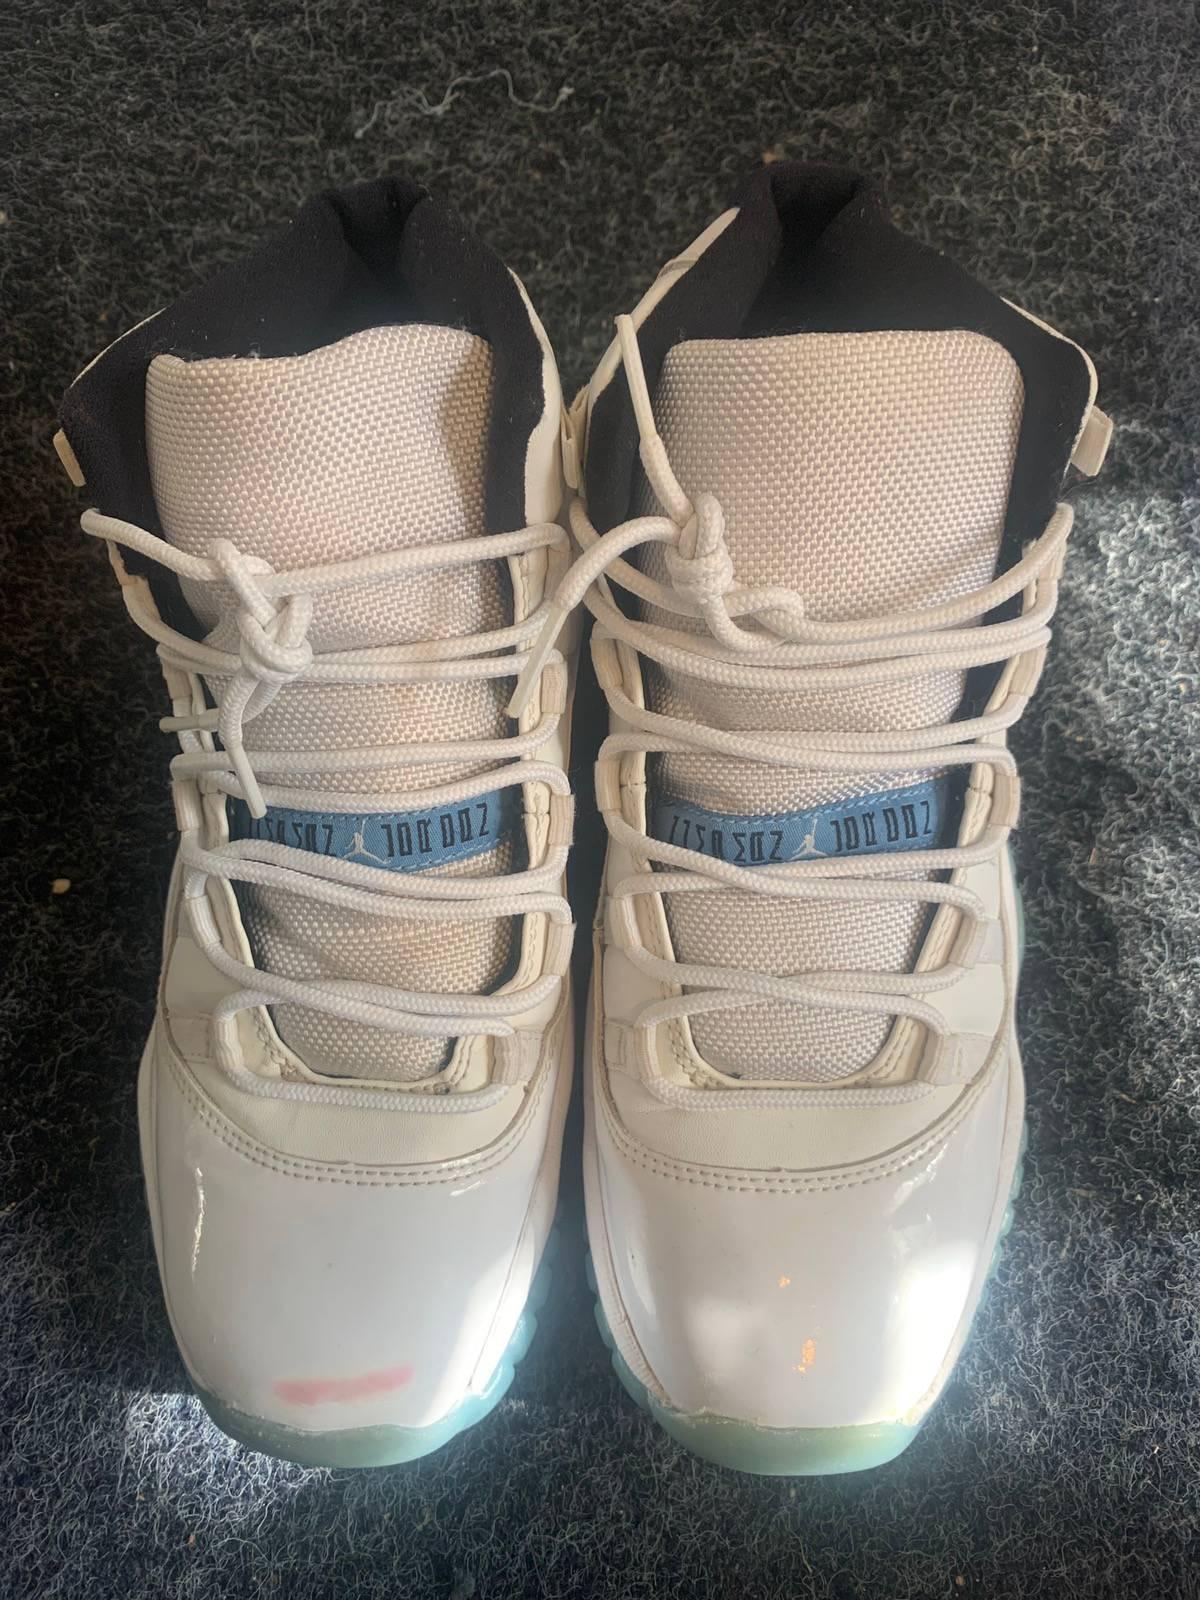 Jordan Brand Air Jordan 11 BG Legend Blue